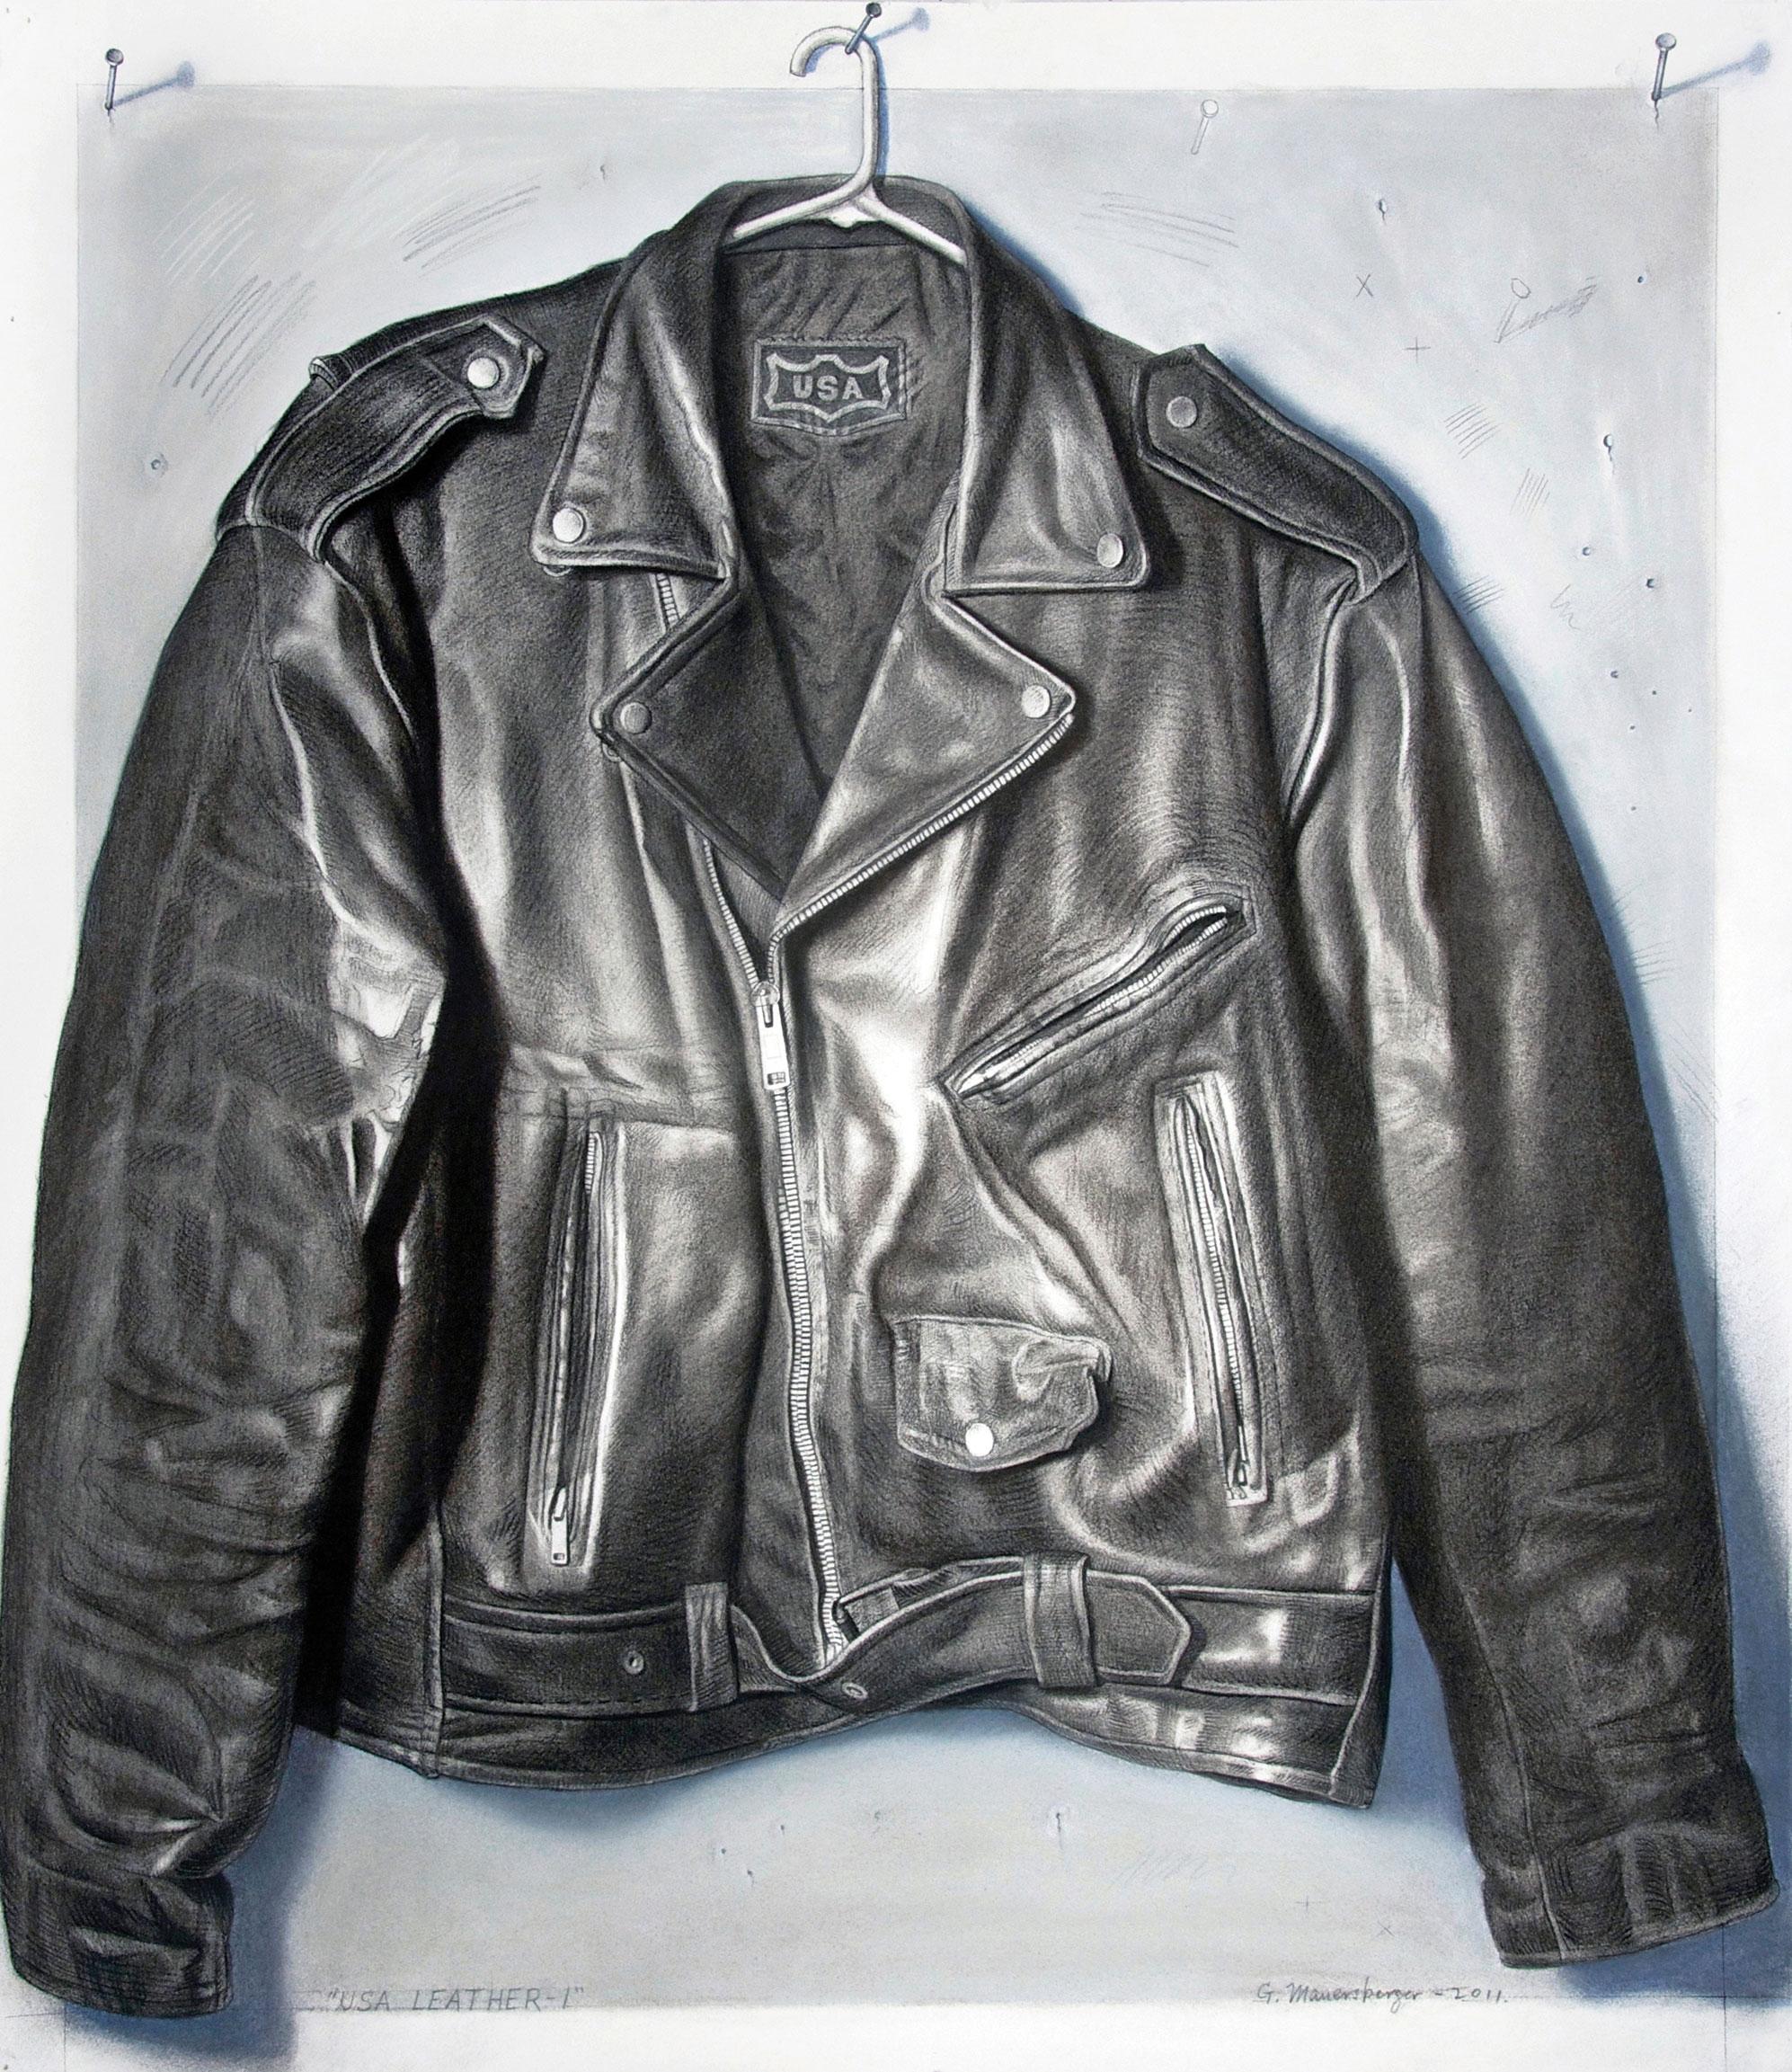 USA Leather 1